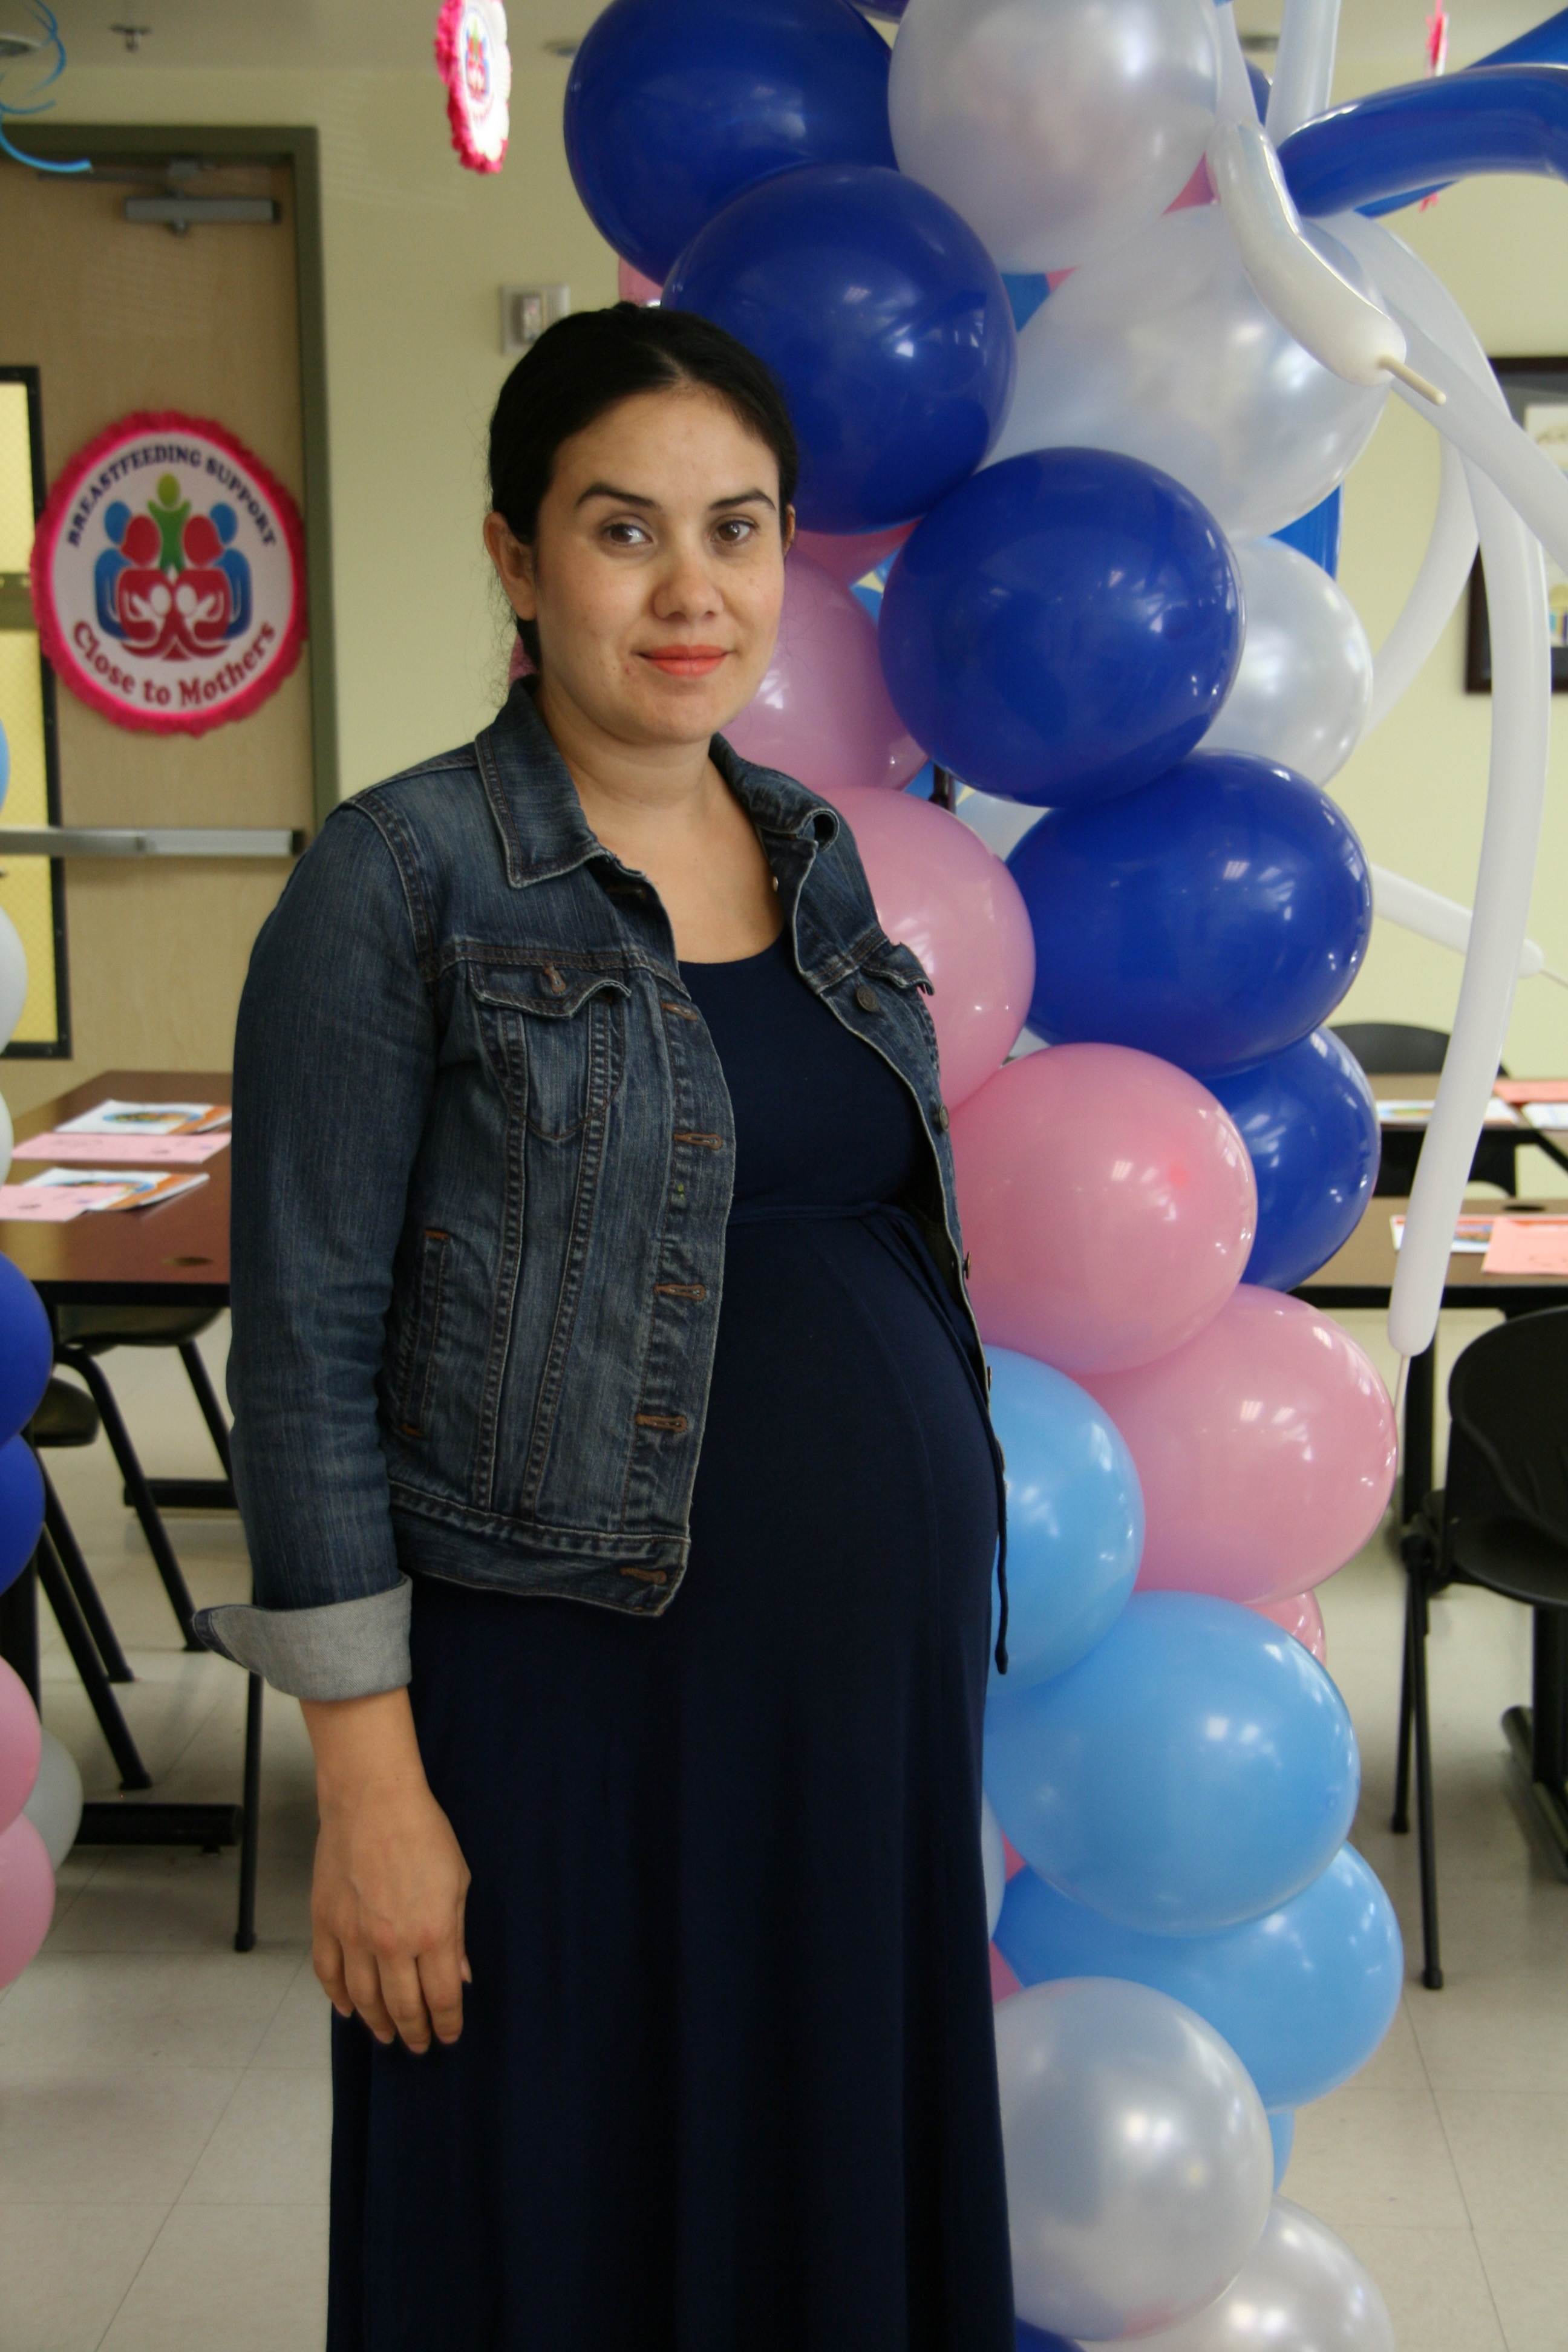 Carmen Escobedo is receiving pregnancy care through Eisn'ers Women's Health Center. Photo courtesy of Eisner Pediatric & Family Medical Center.